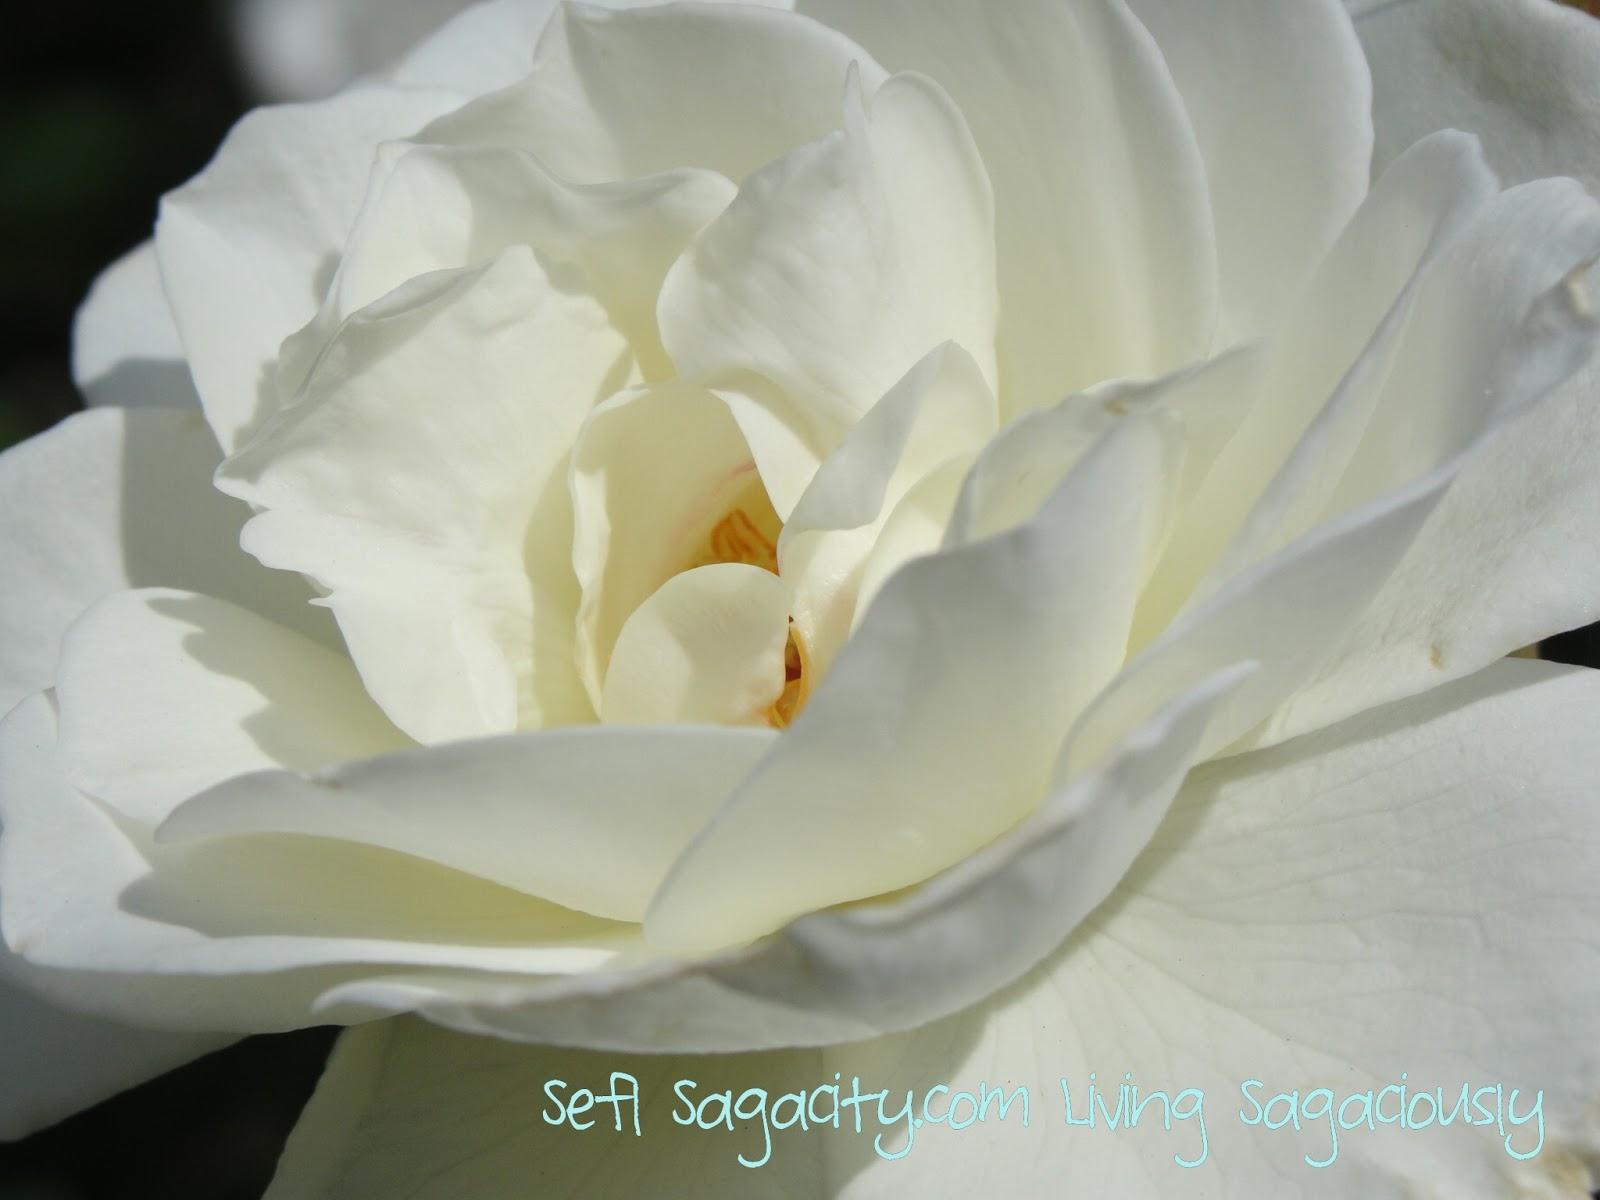 White Carpet Roses Self Sagacity